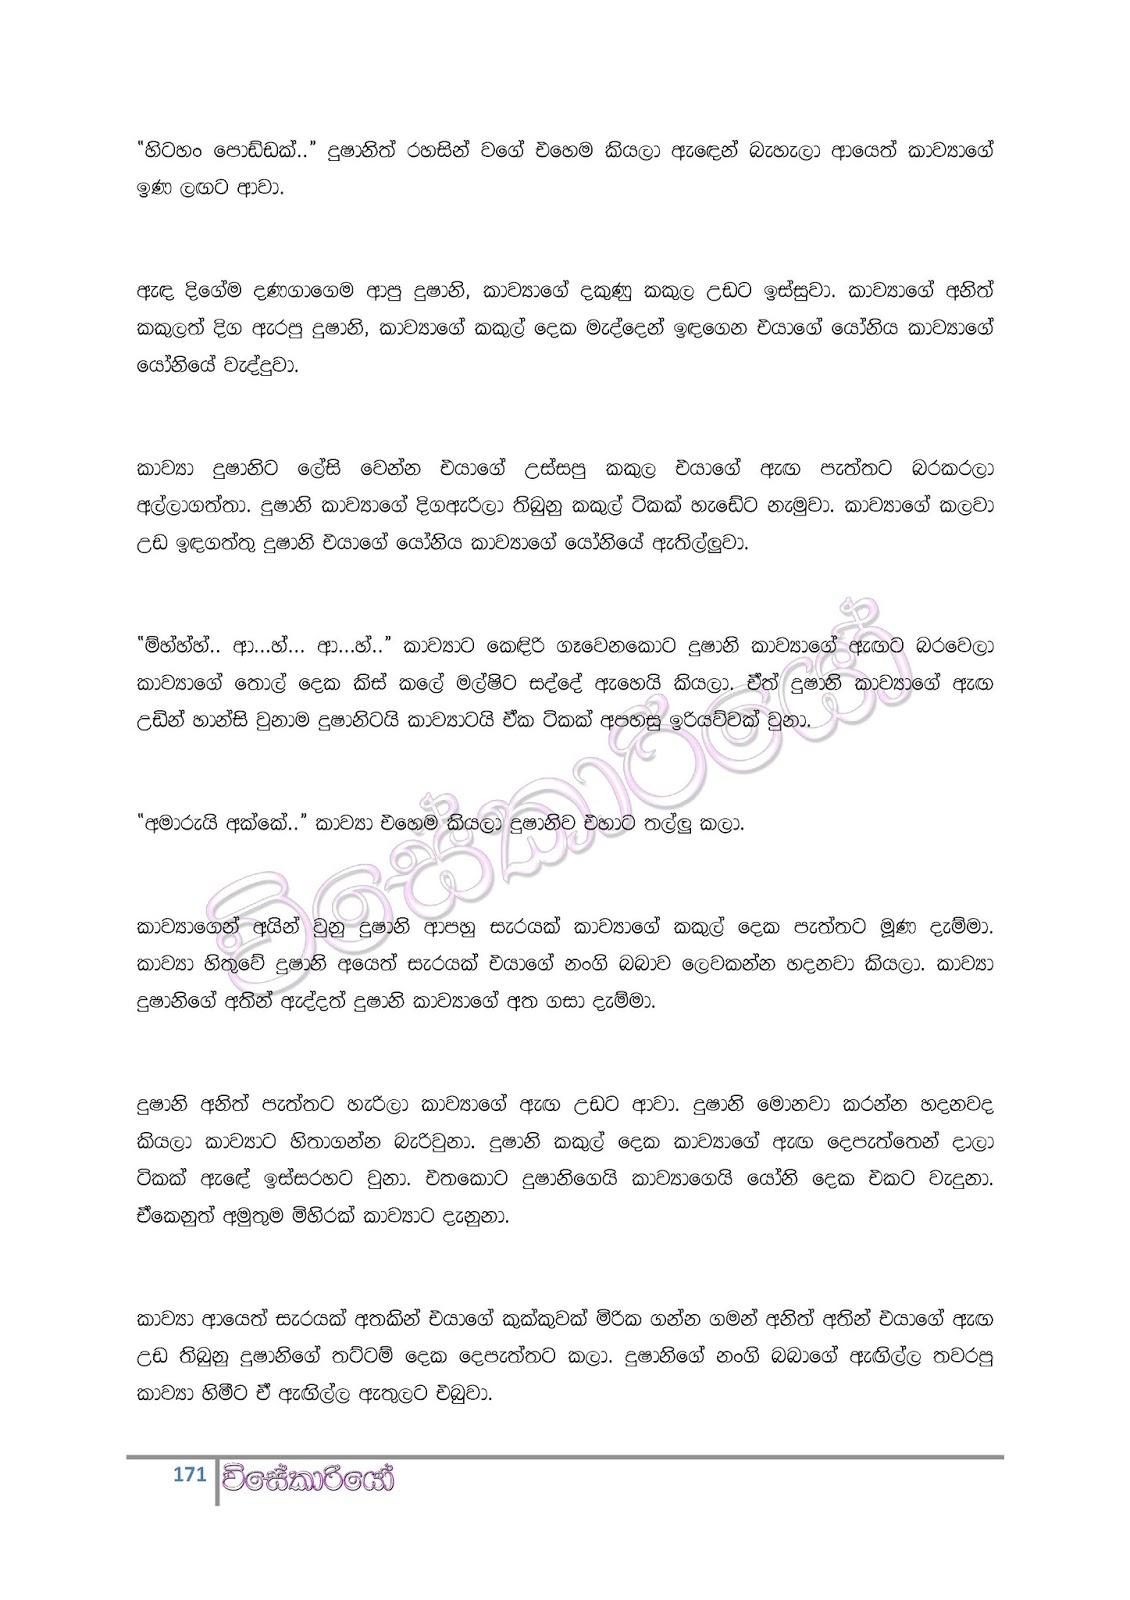 Images of Sinhala Wal Katha 18 - #rock-cafe